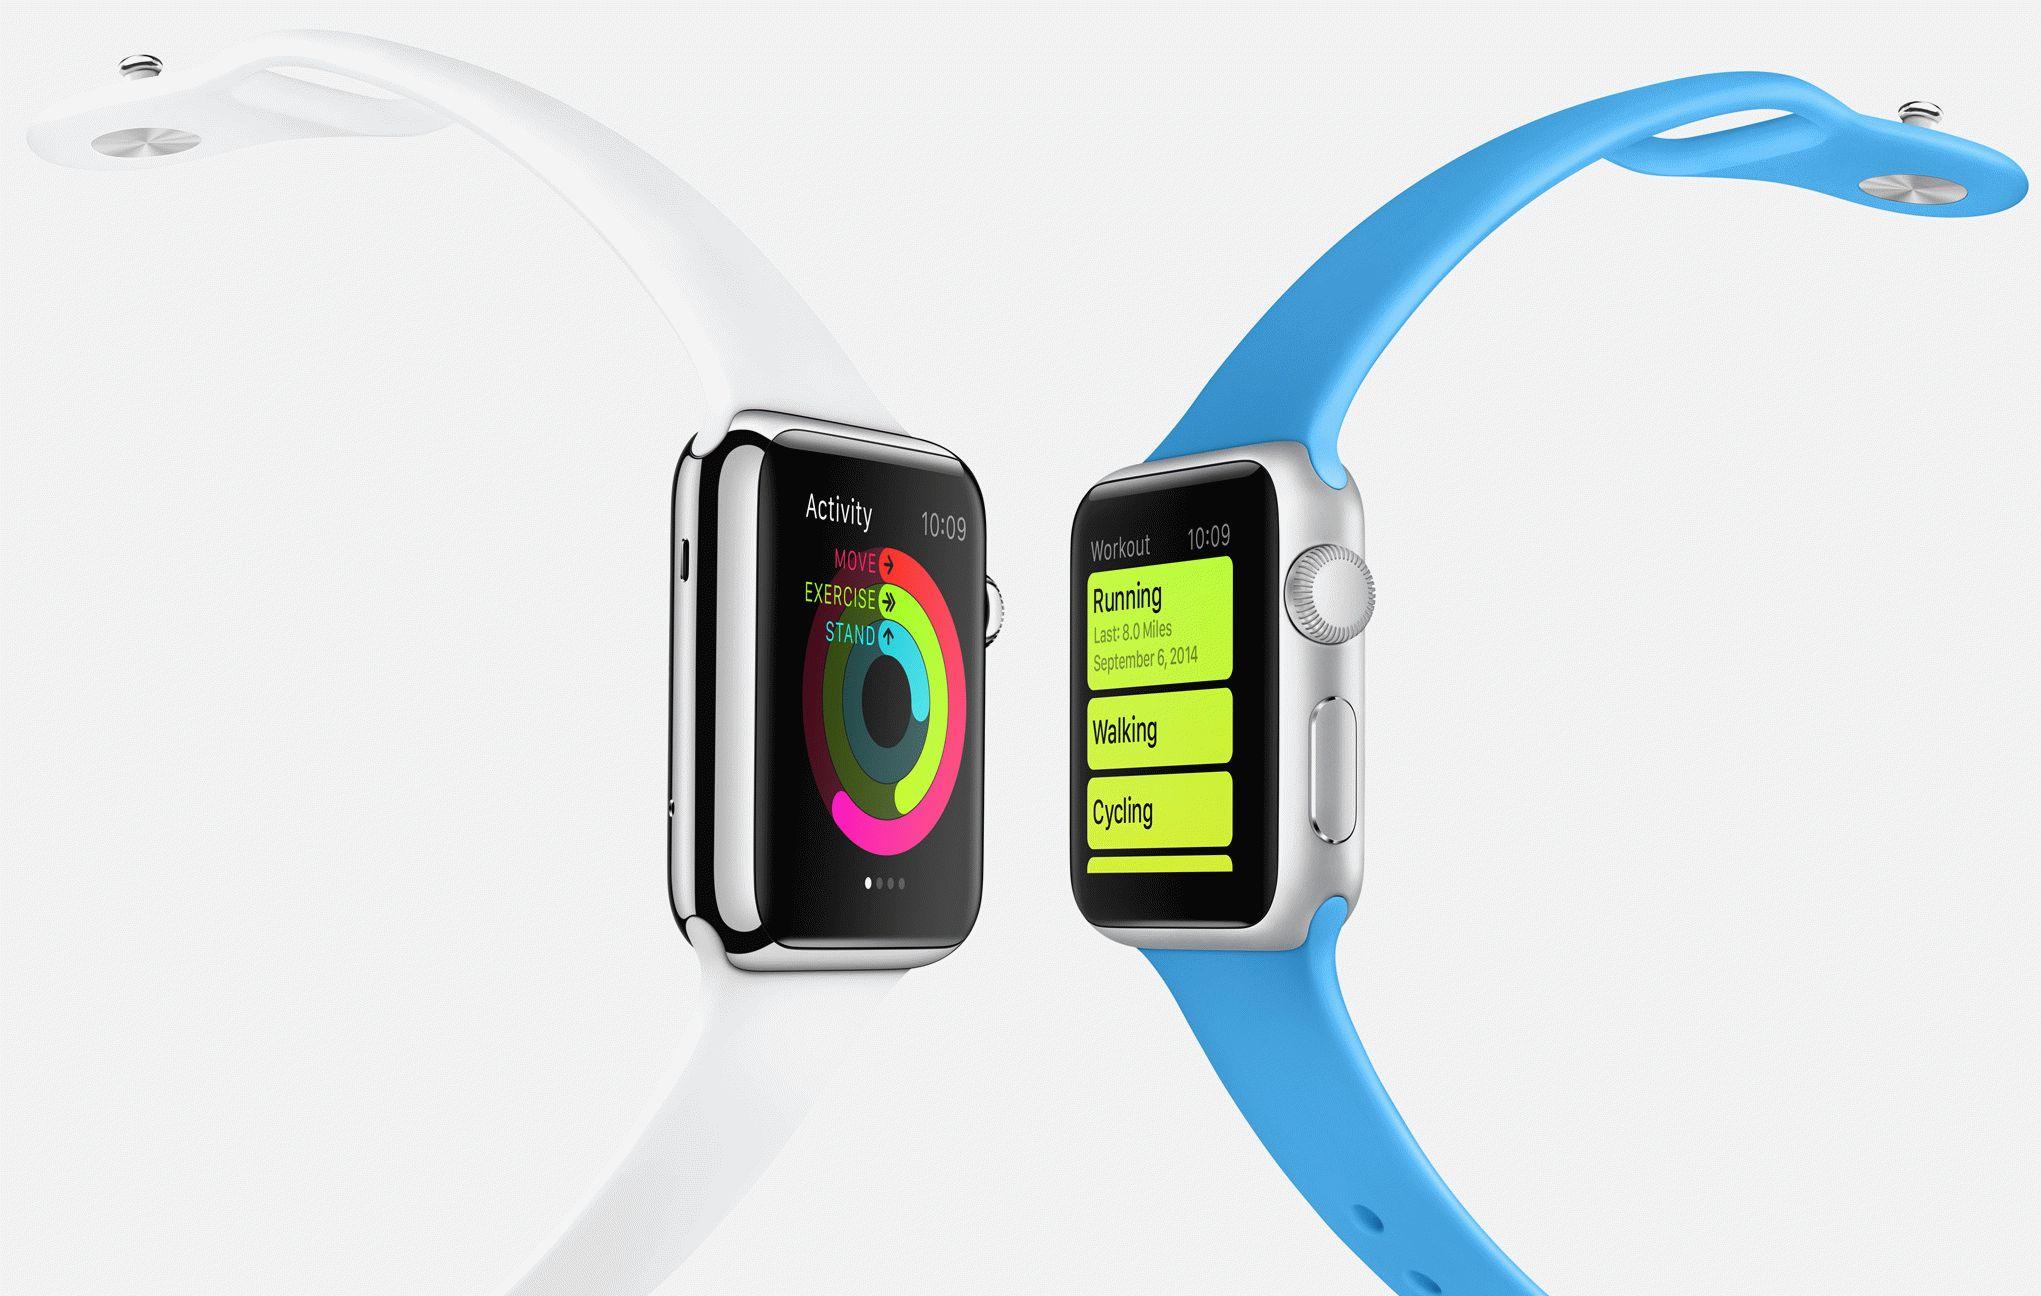 Apple-Watch-health-fitness-white-blue